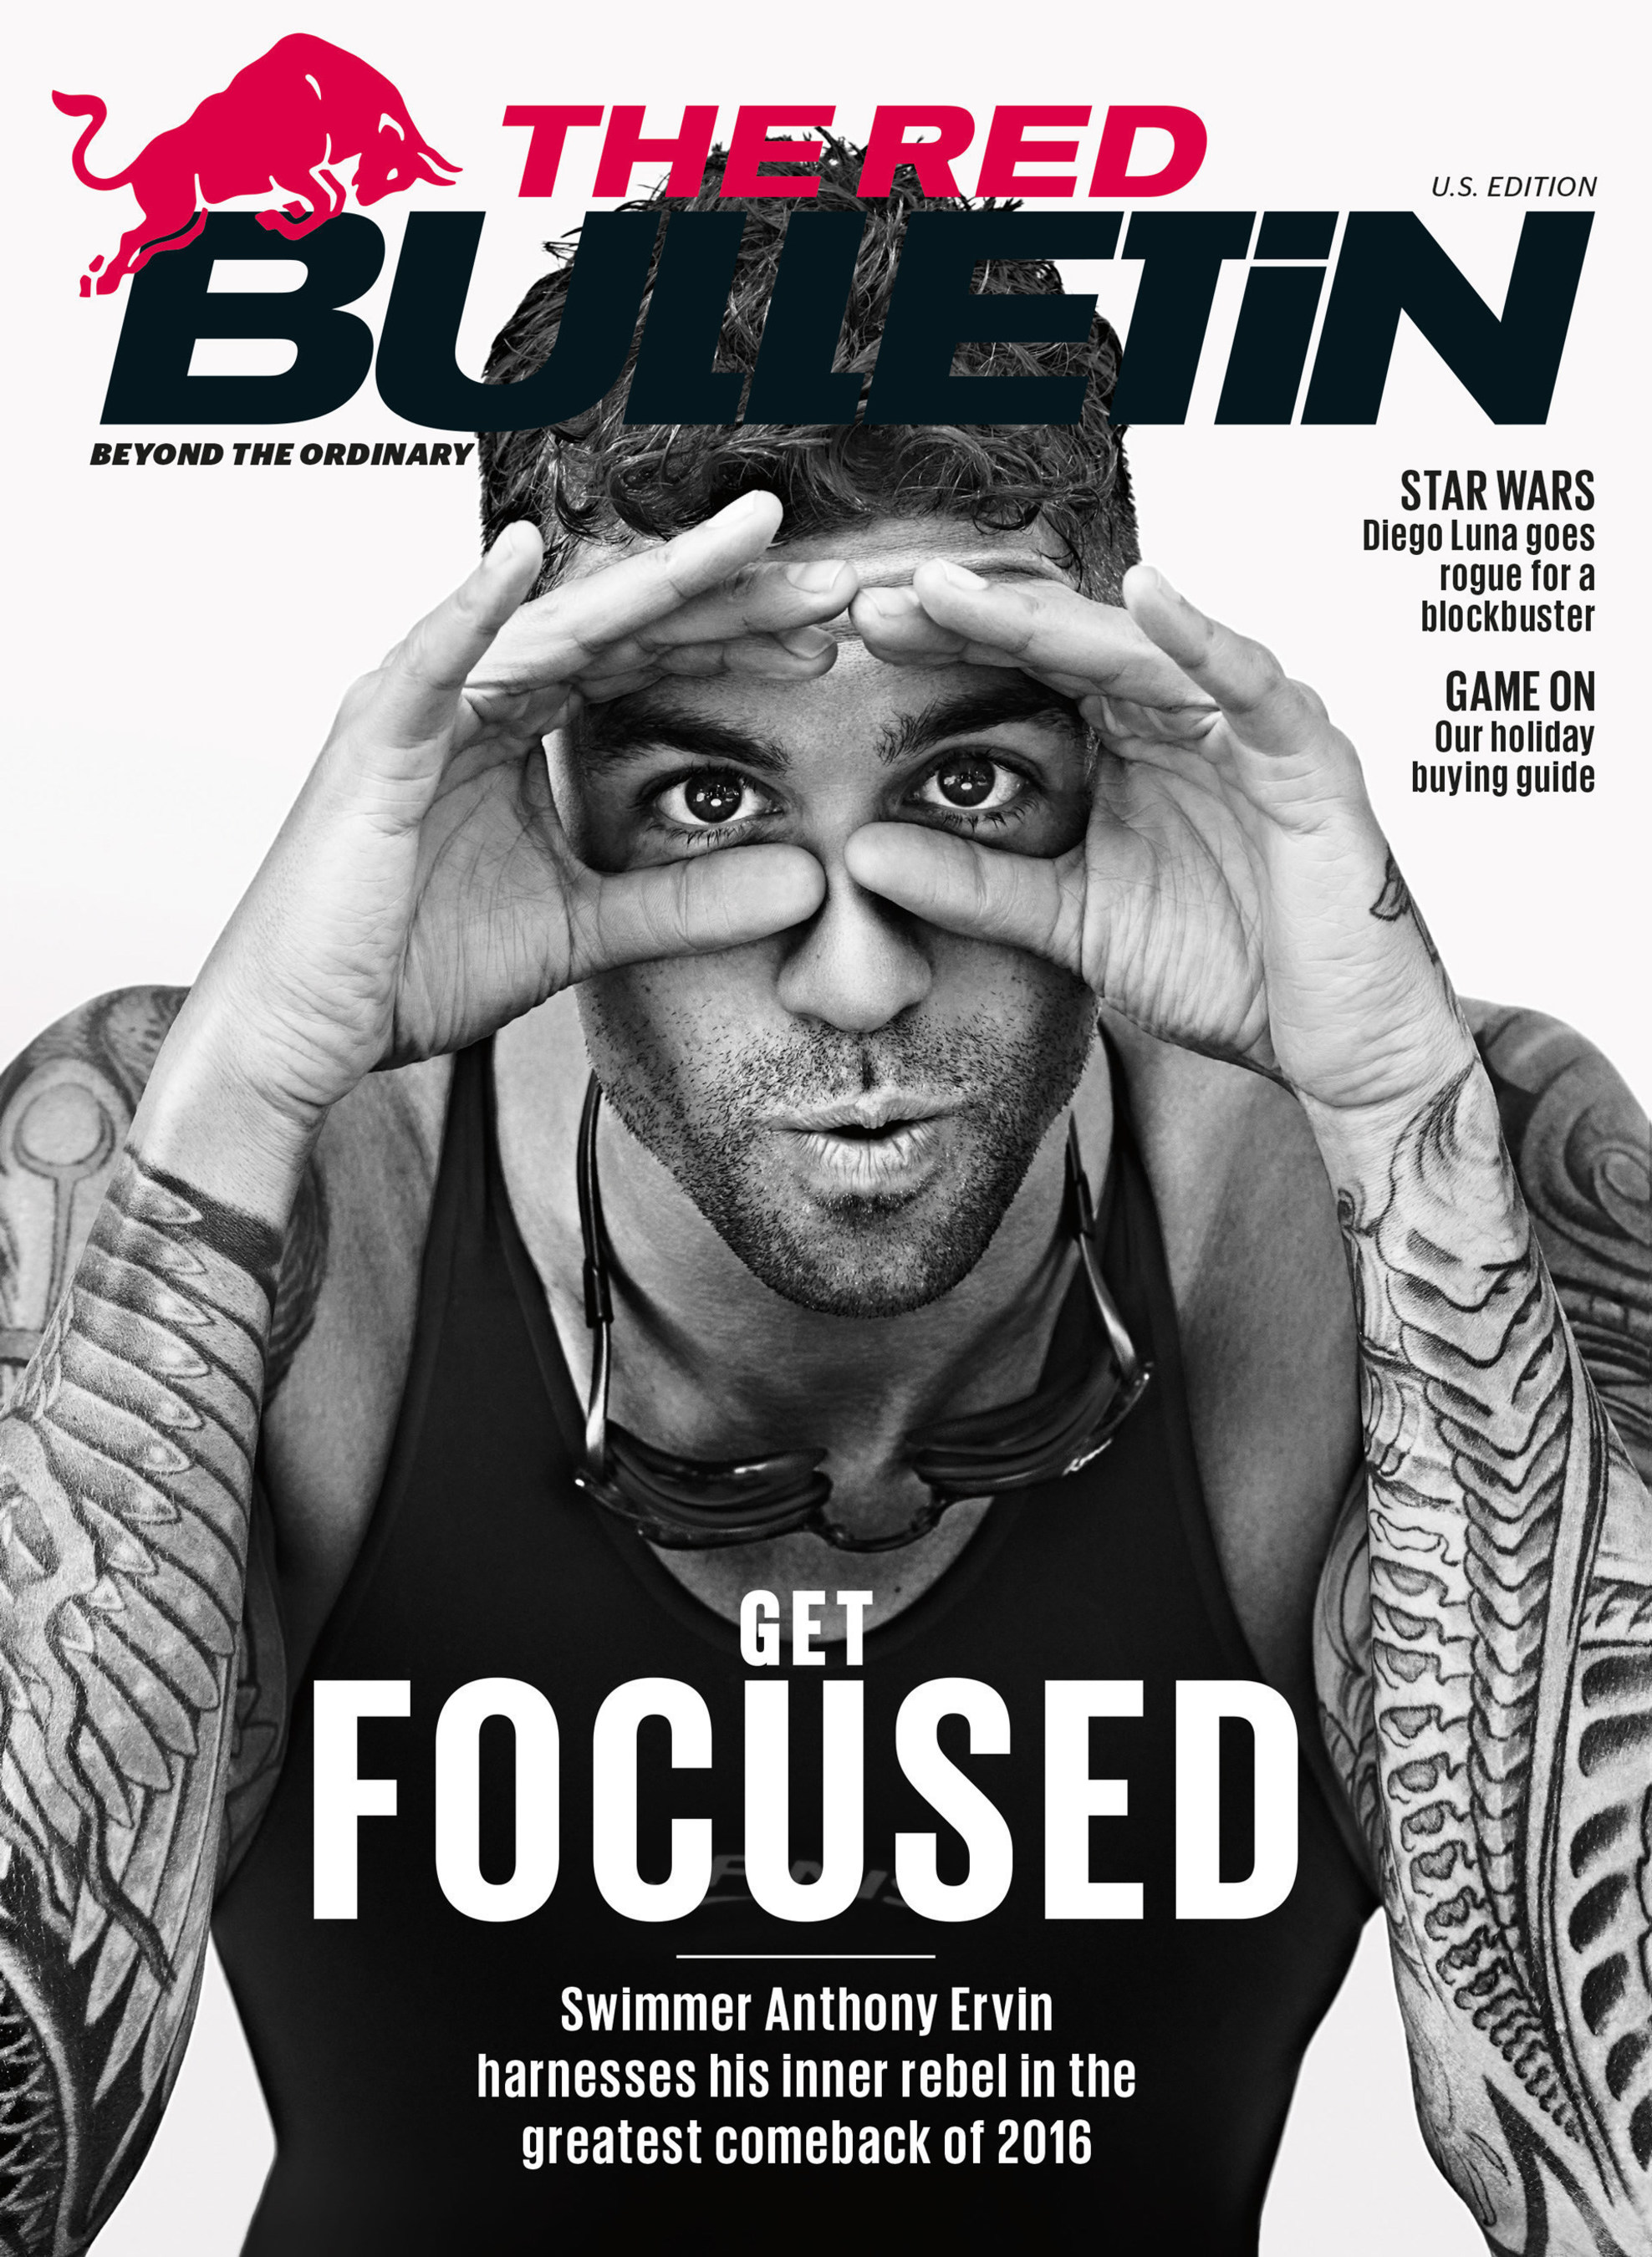 Red Bulletin, December 2016 issue